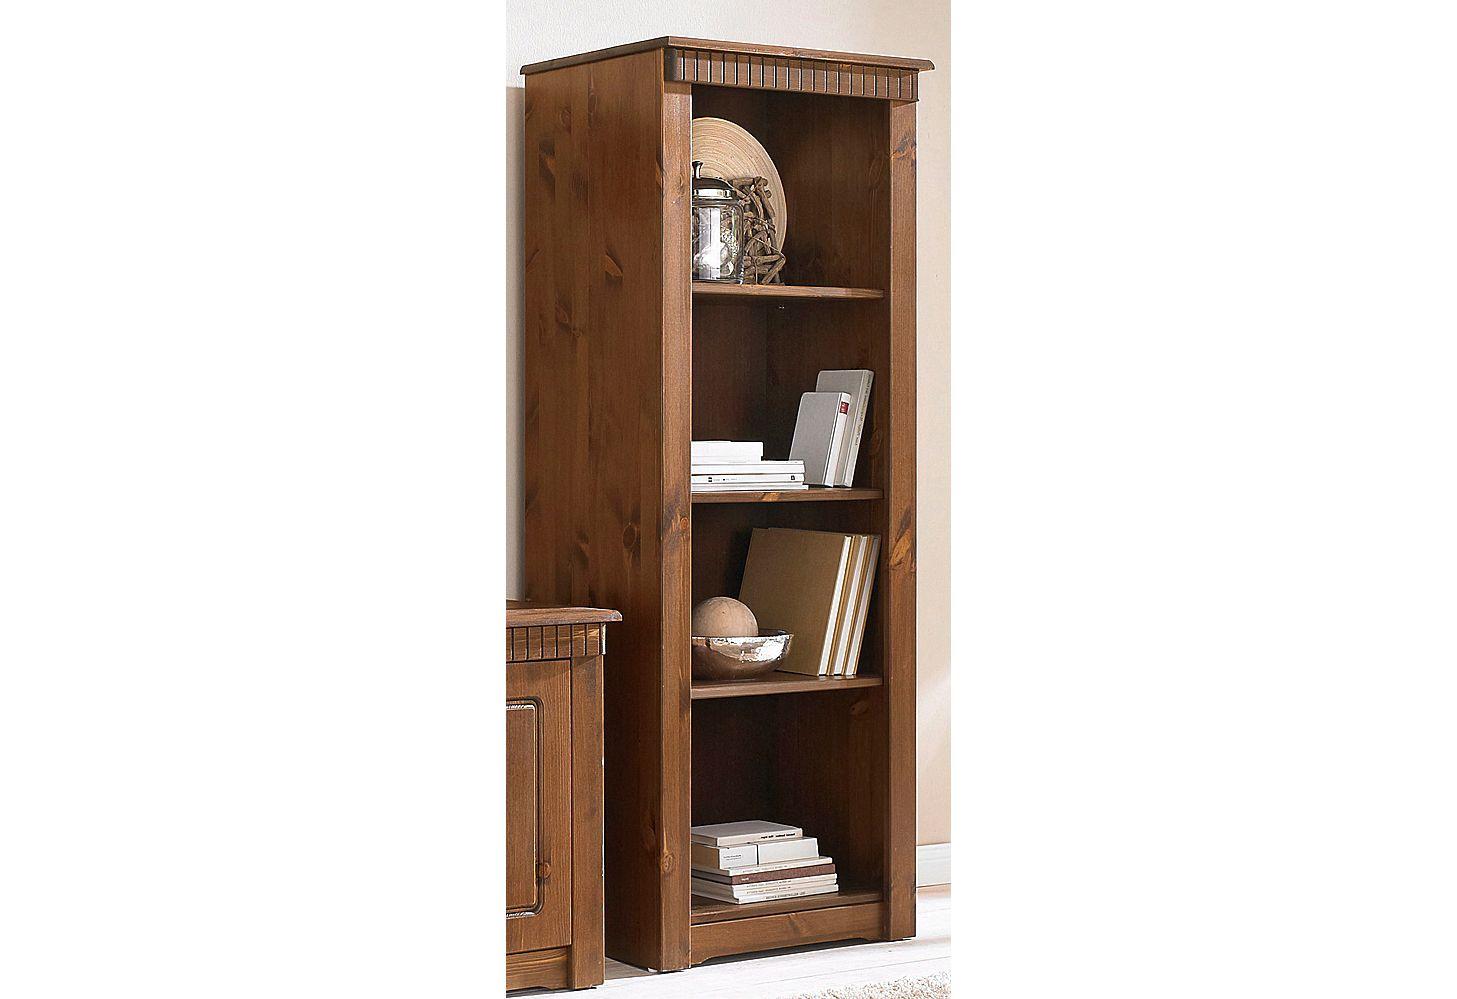 regal home affaire breite 55 cm h he 138 cm schwab versand tv lowboards. Black Bedroom Furniture Sets. Home Design Ideas